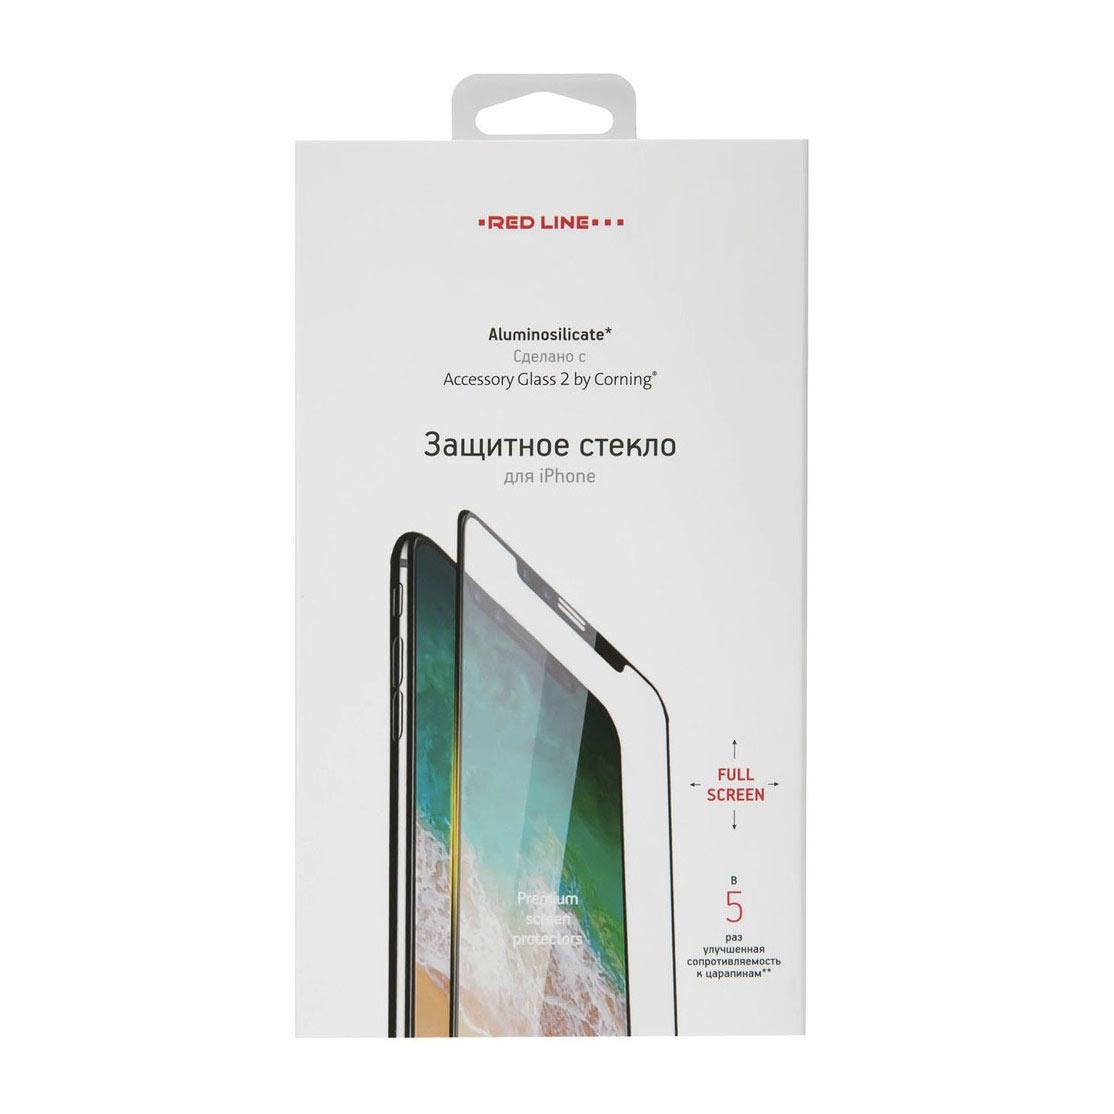 Фото - Защитное стекло Red Line Corning Full Screen для Apple iPhone 12 Pro Max, чёрная рамка защитное стекло red line corning full screen для apple iphone 12 pro черный